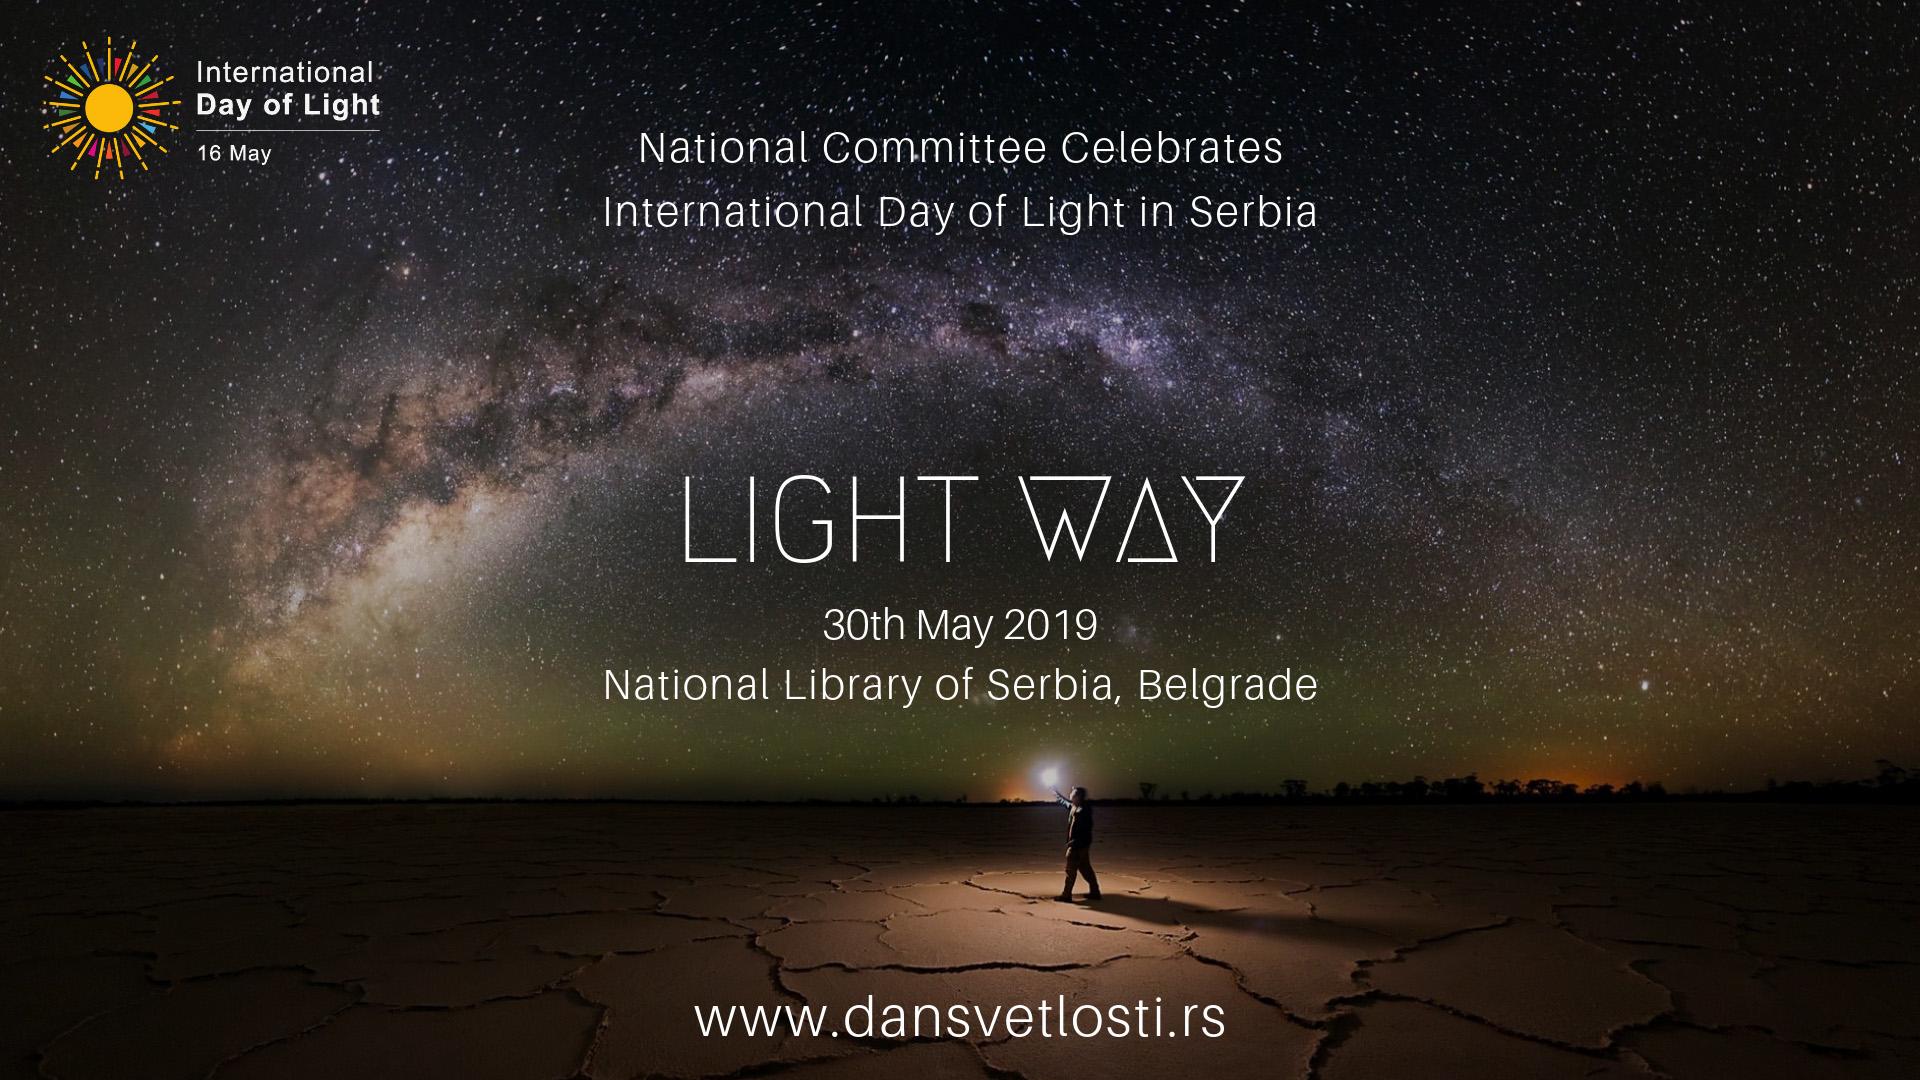 International Day of Light in Serbia